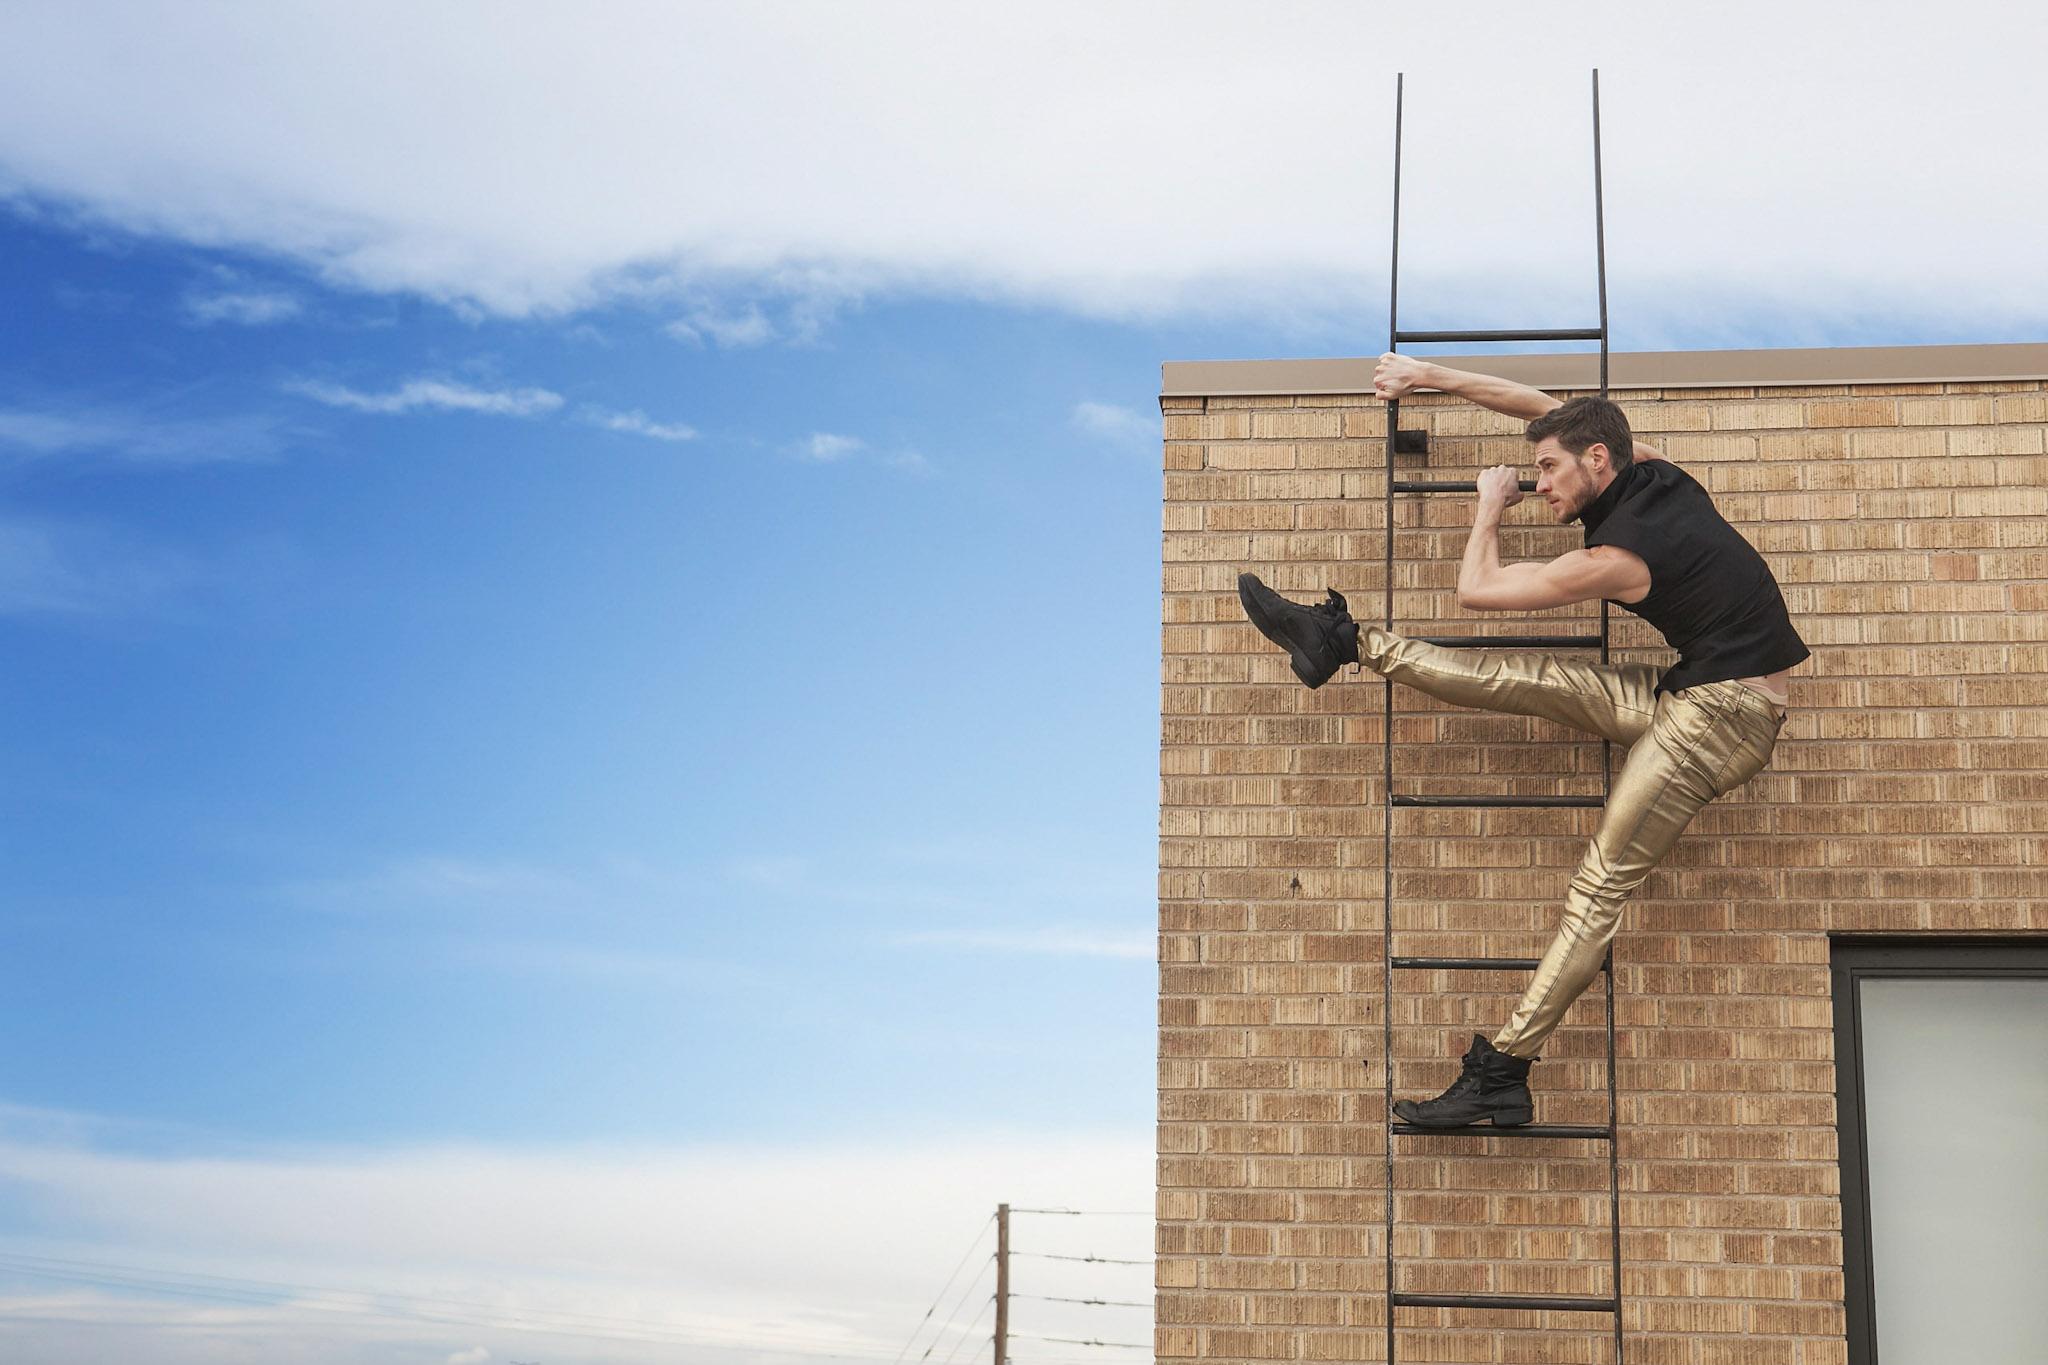 Denver-Photo-Studio-For-Rent-Colorado-Rental-Photography-Studio-Photographer-Studio-for-Rent-Denver-Skyline-Rooftop-Dance-Portraits-Kokoro-Photography